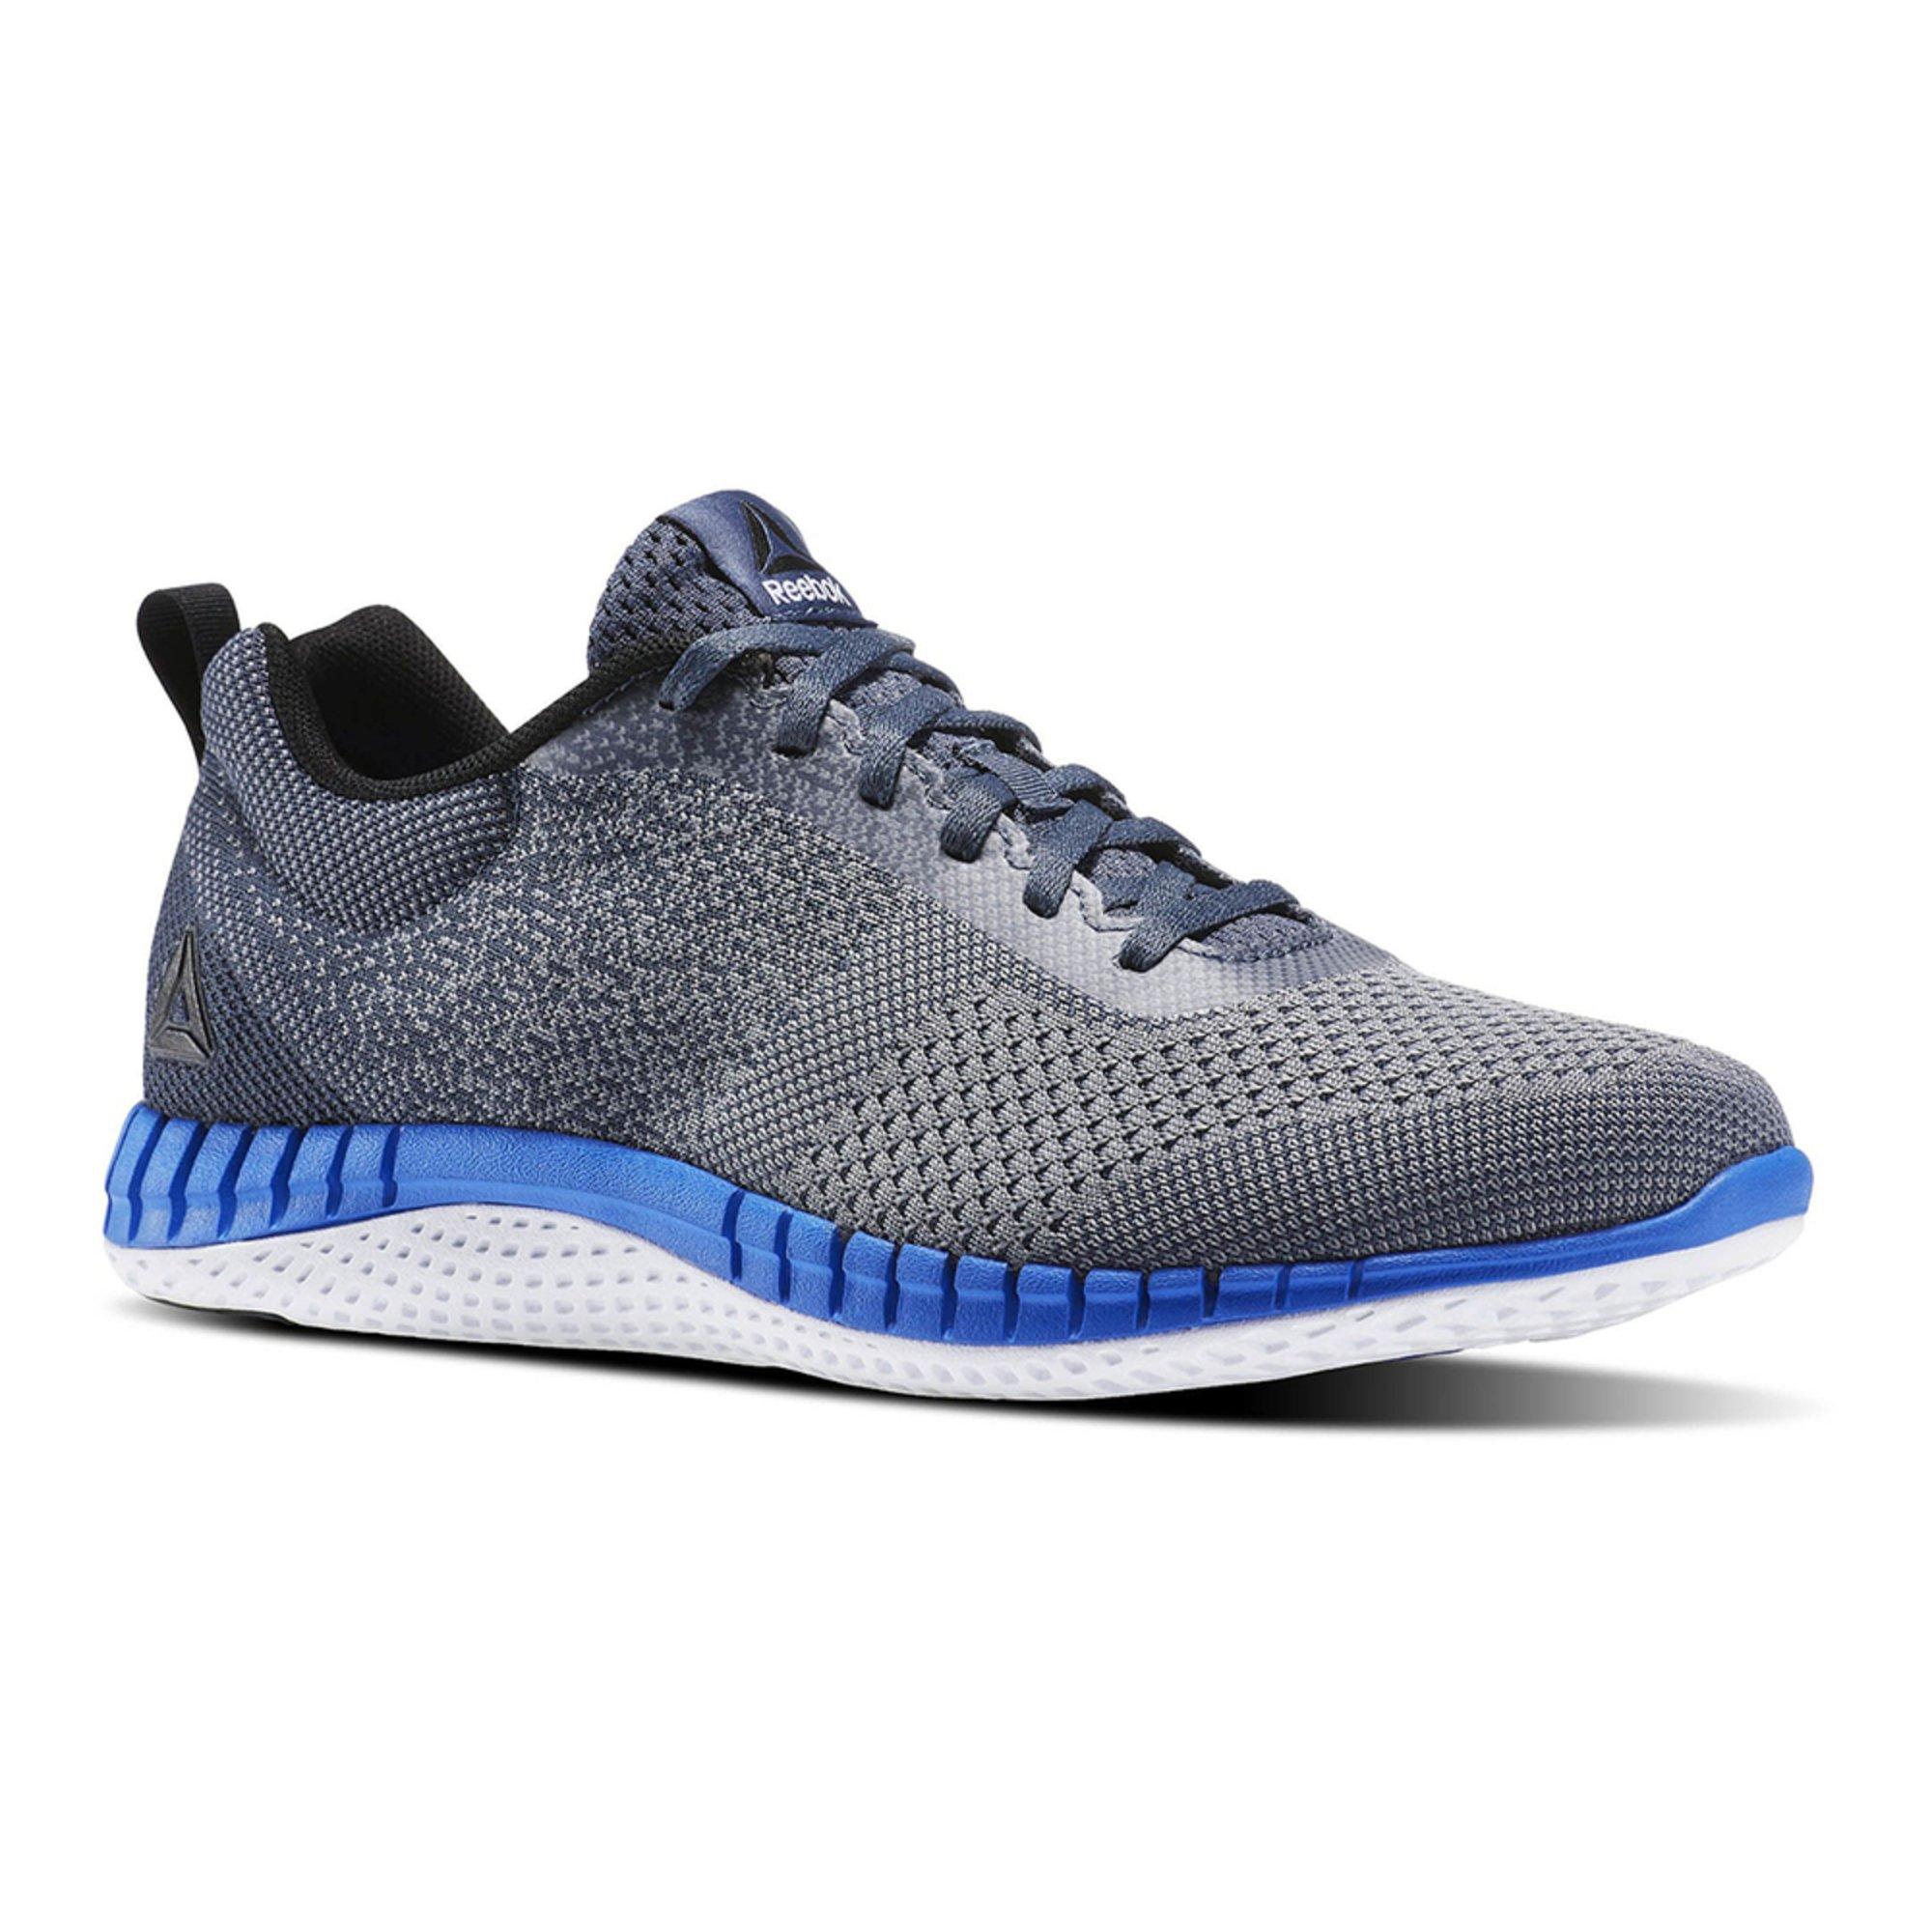 Reebok Print Run Prime Men S Running Shoes